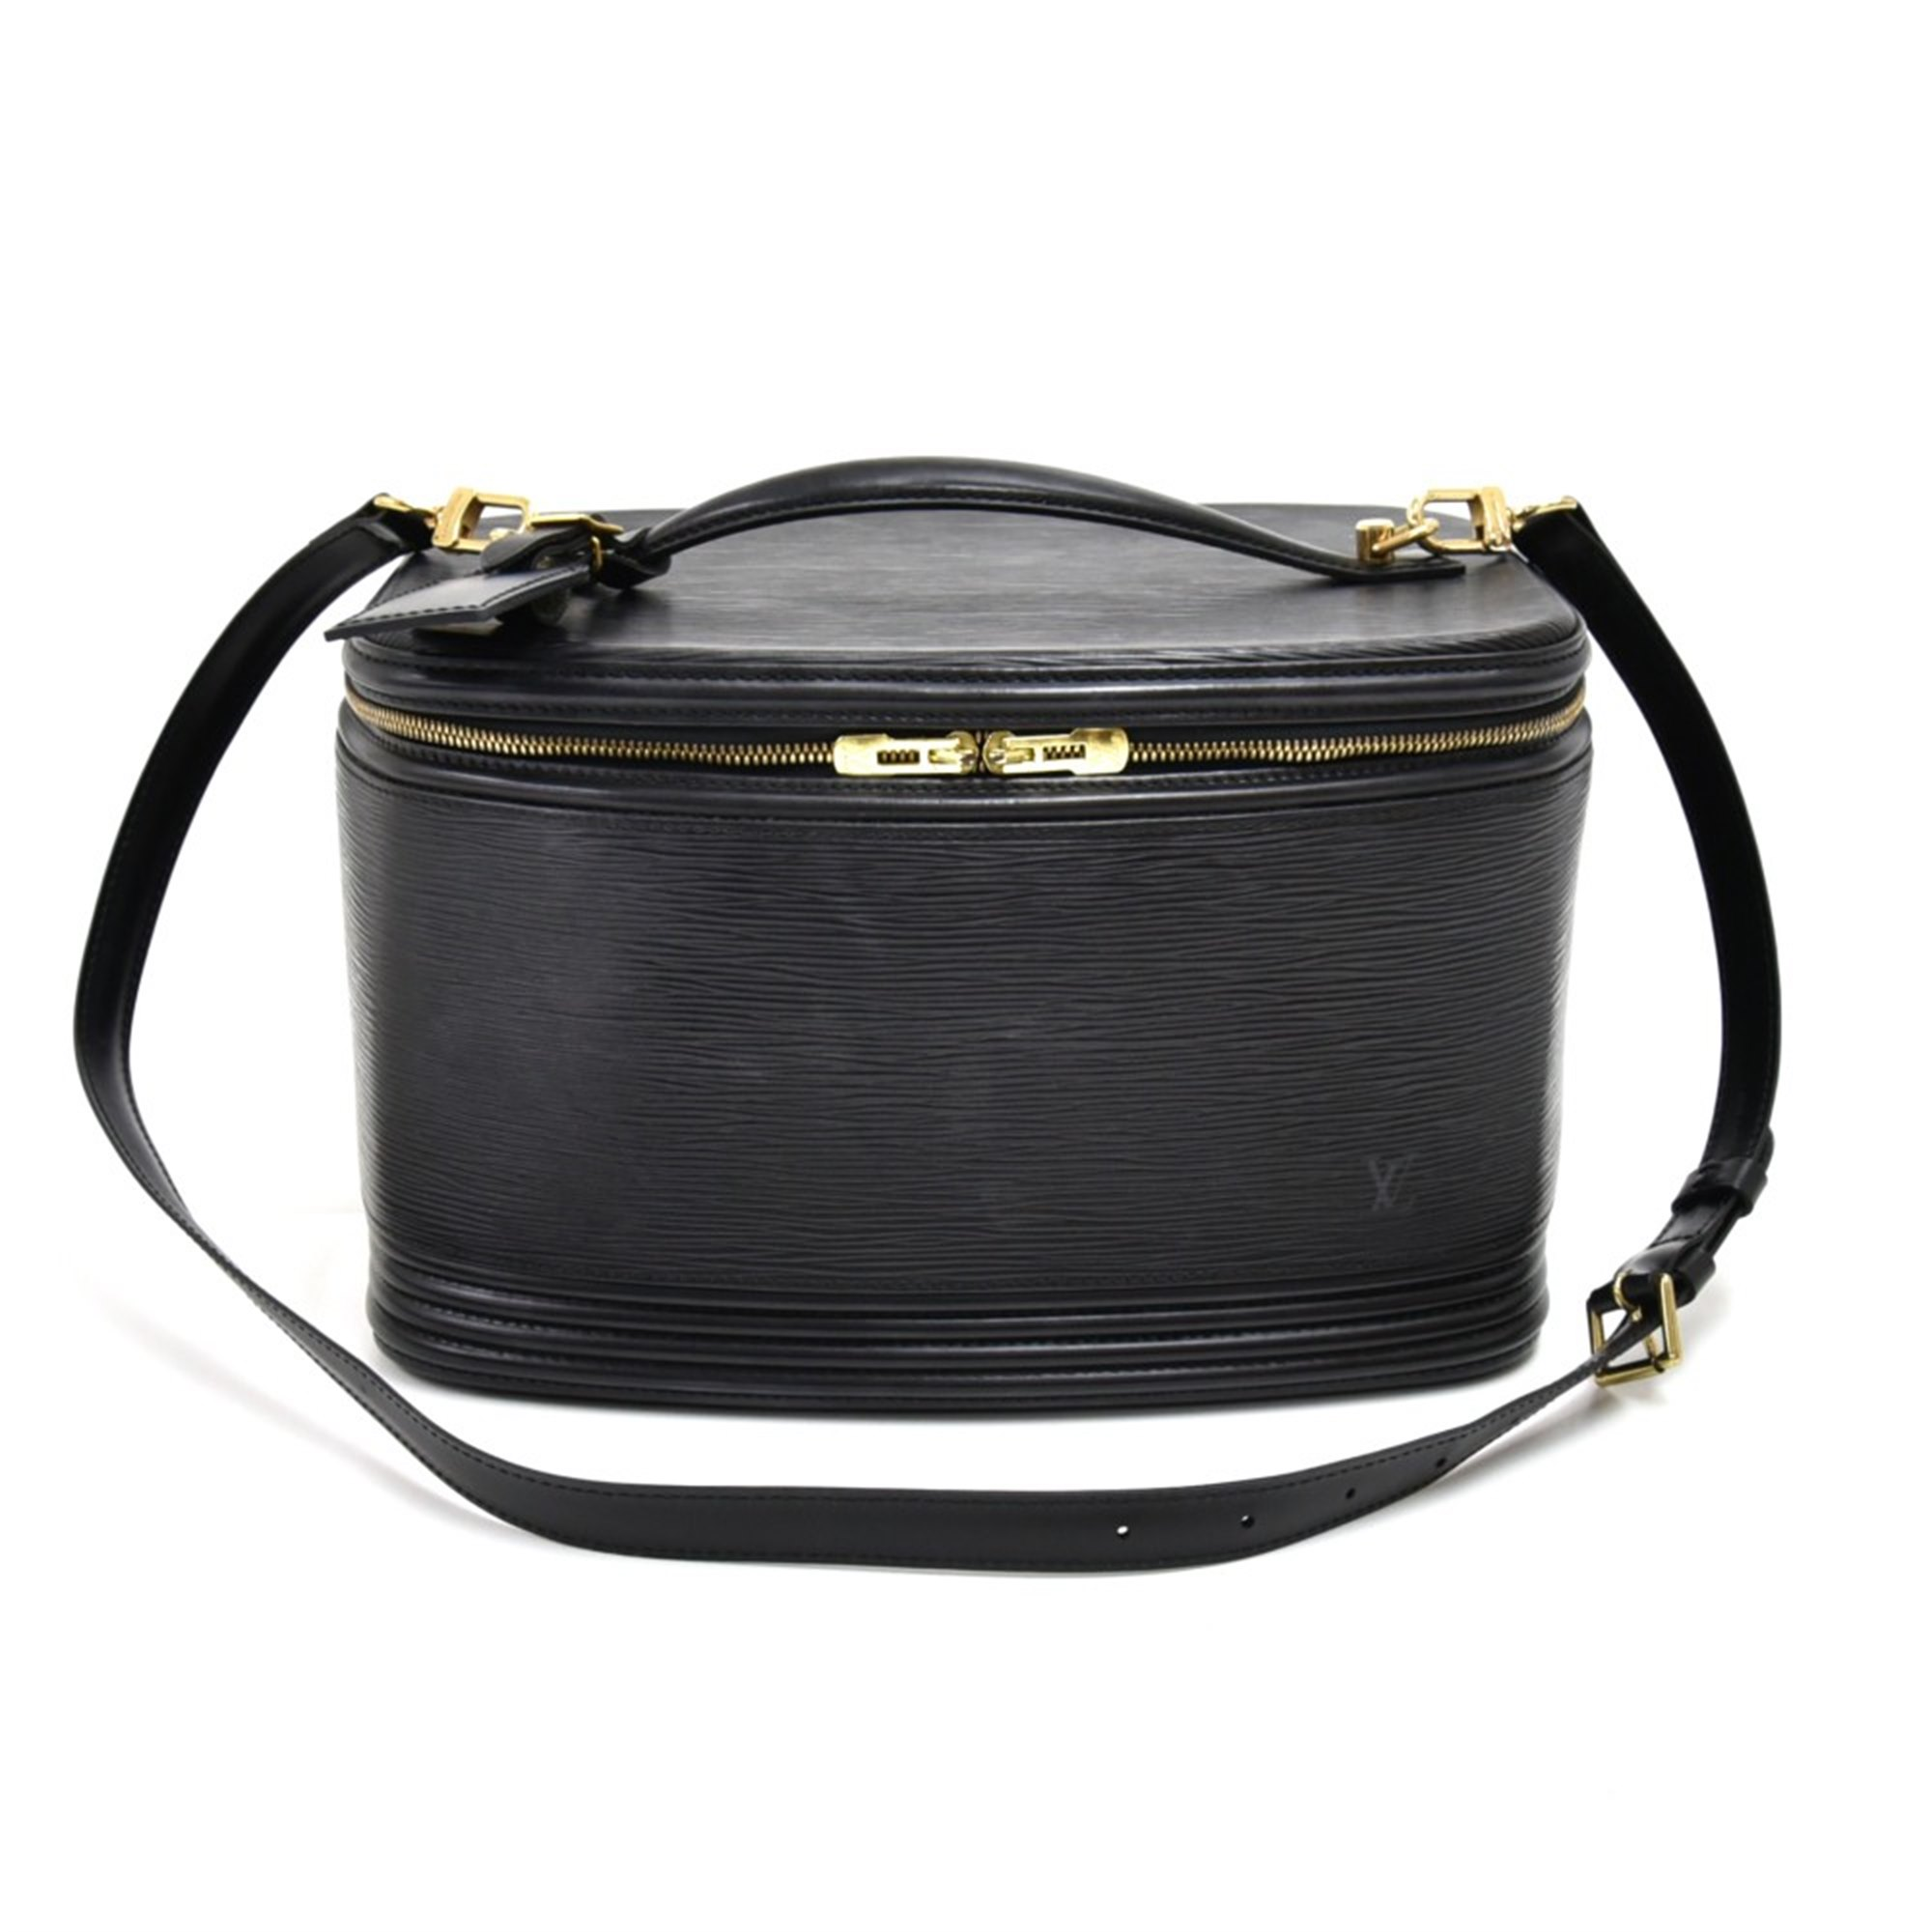 Louis Vuitton Vanity Case 1995 Fm Ls923 Second Hand Handbags